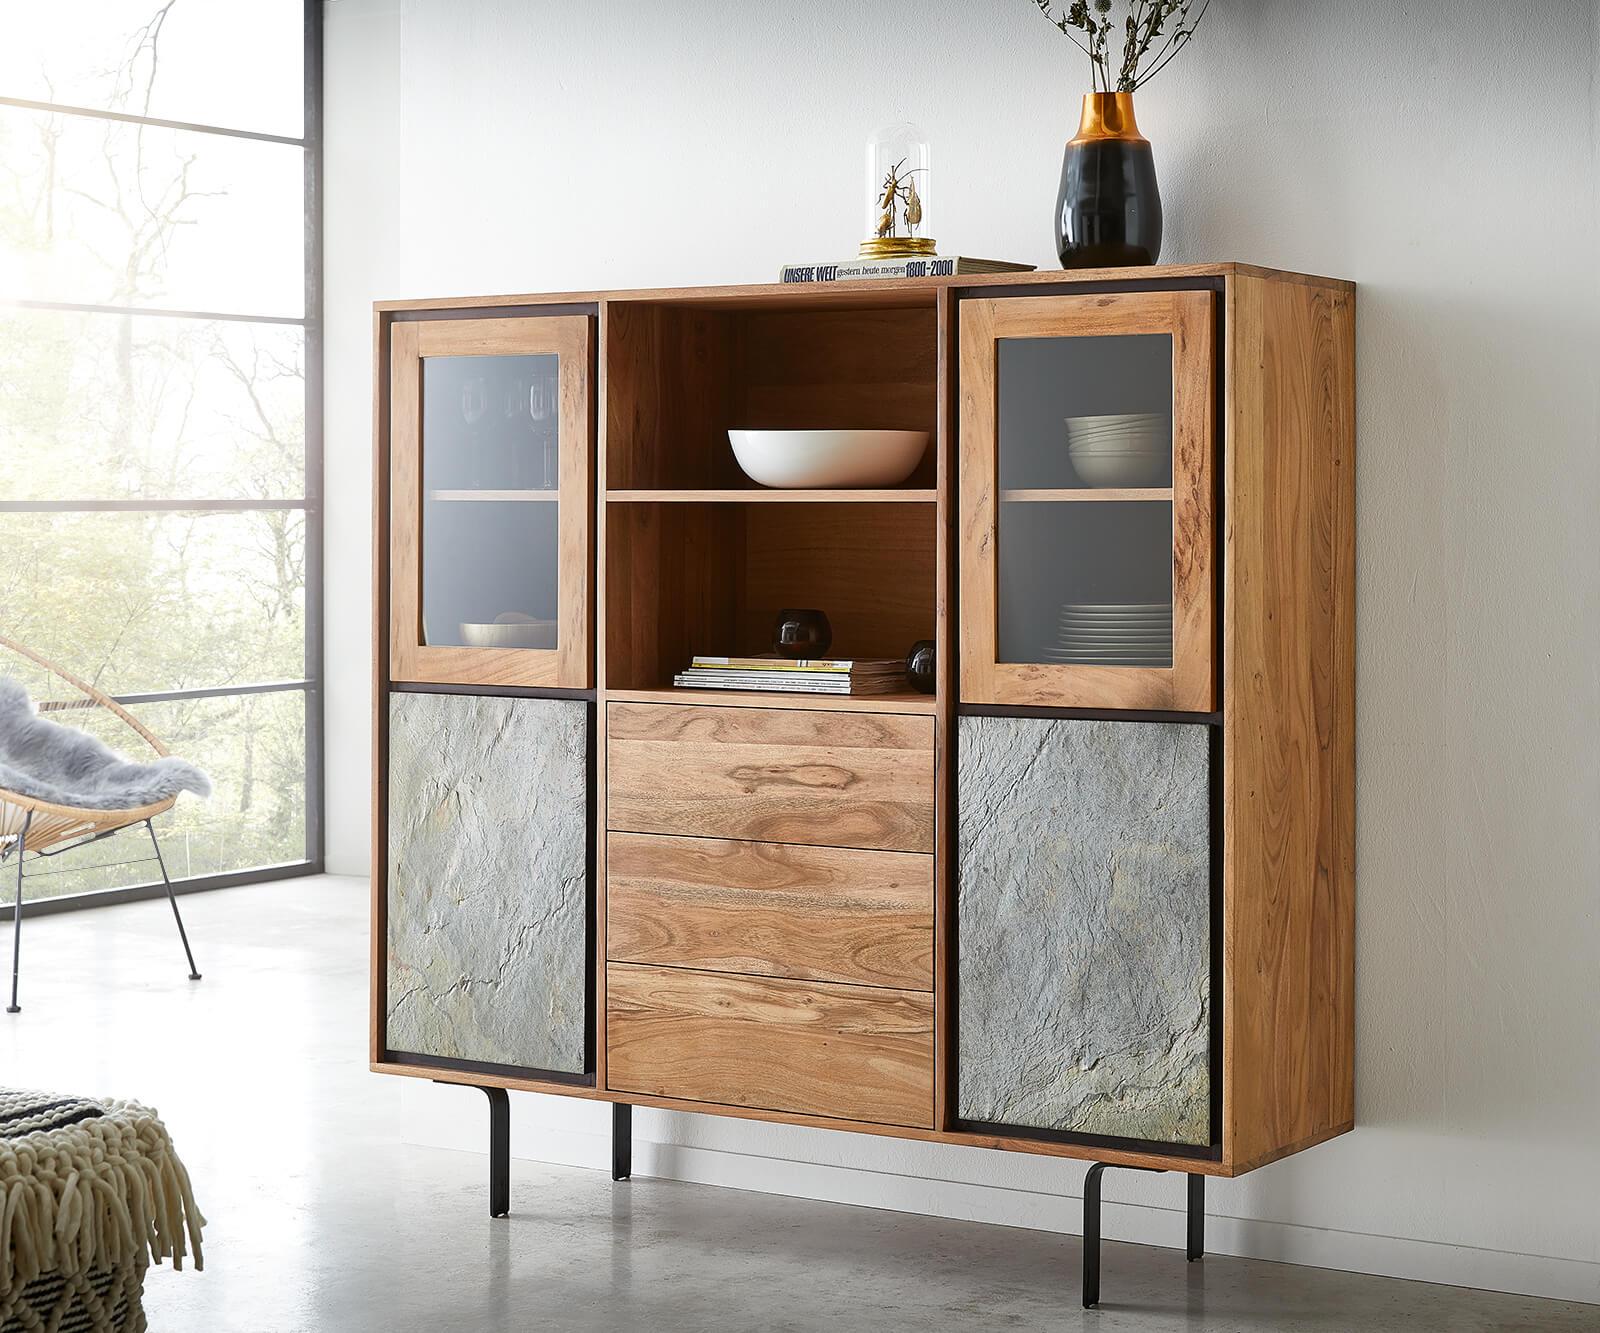 delife-vitrine-juwelo-147-cm-akazie-natur-mit-steinfurnier-highboard-vitrinen